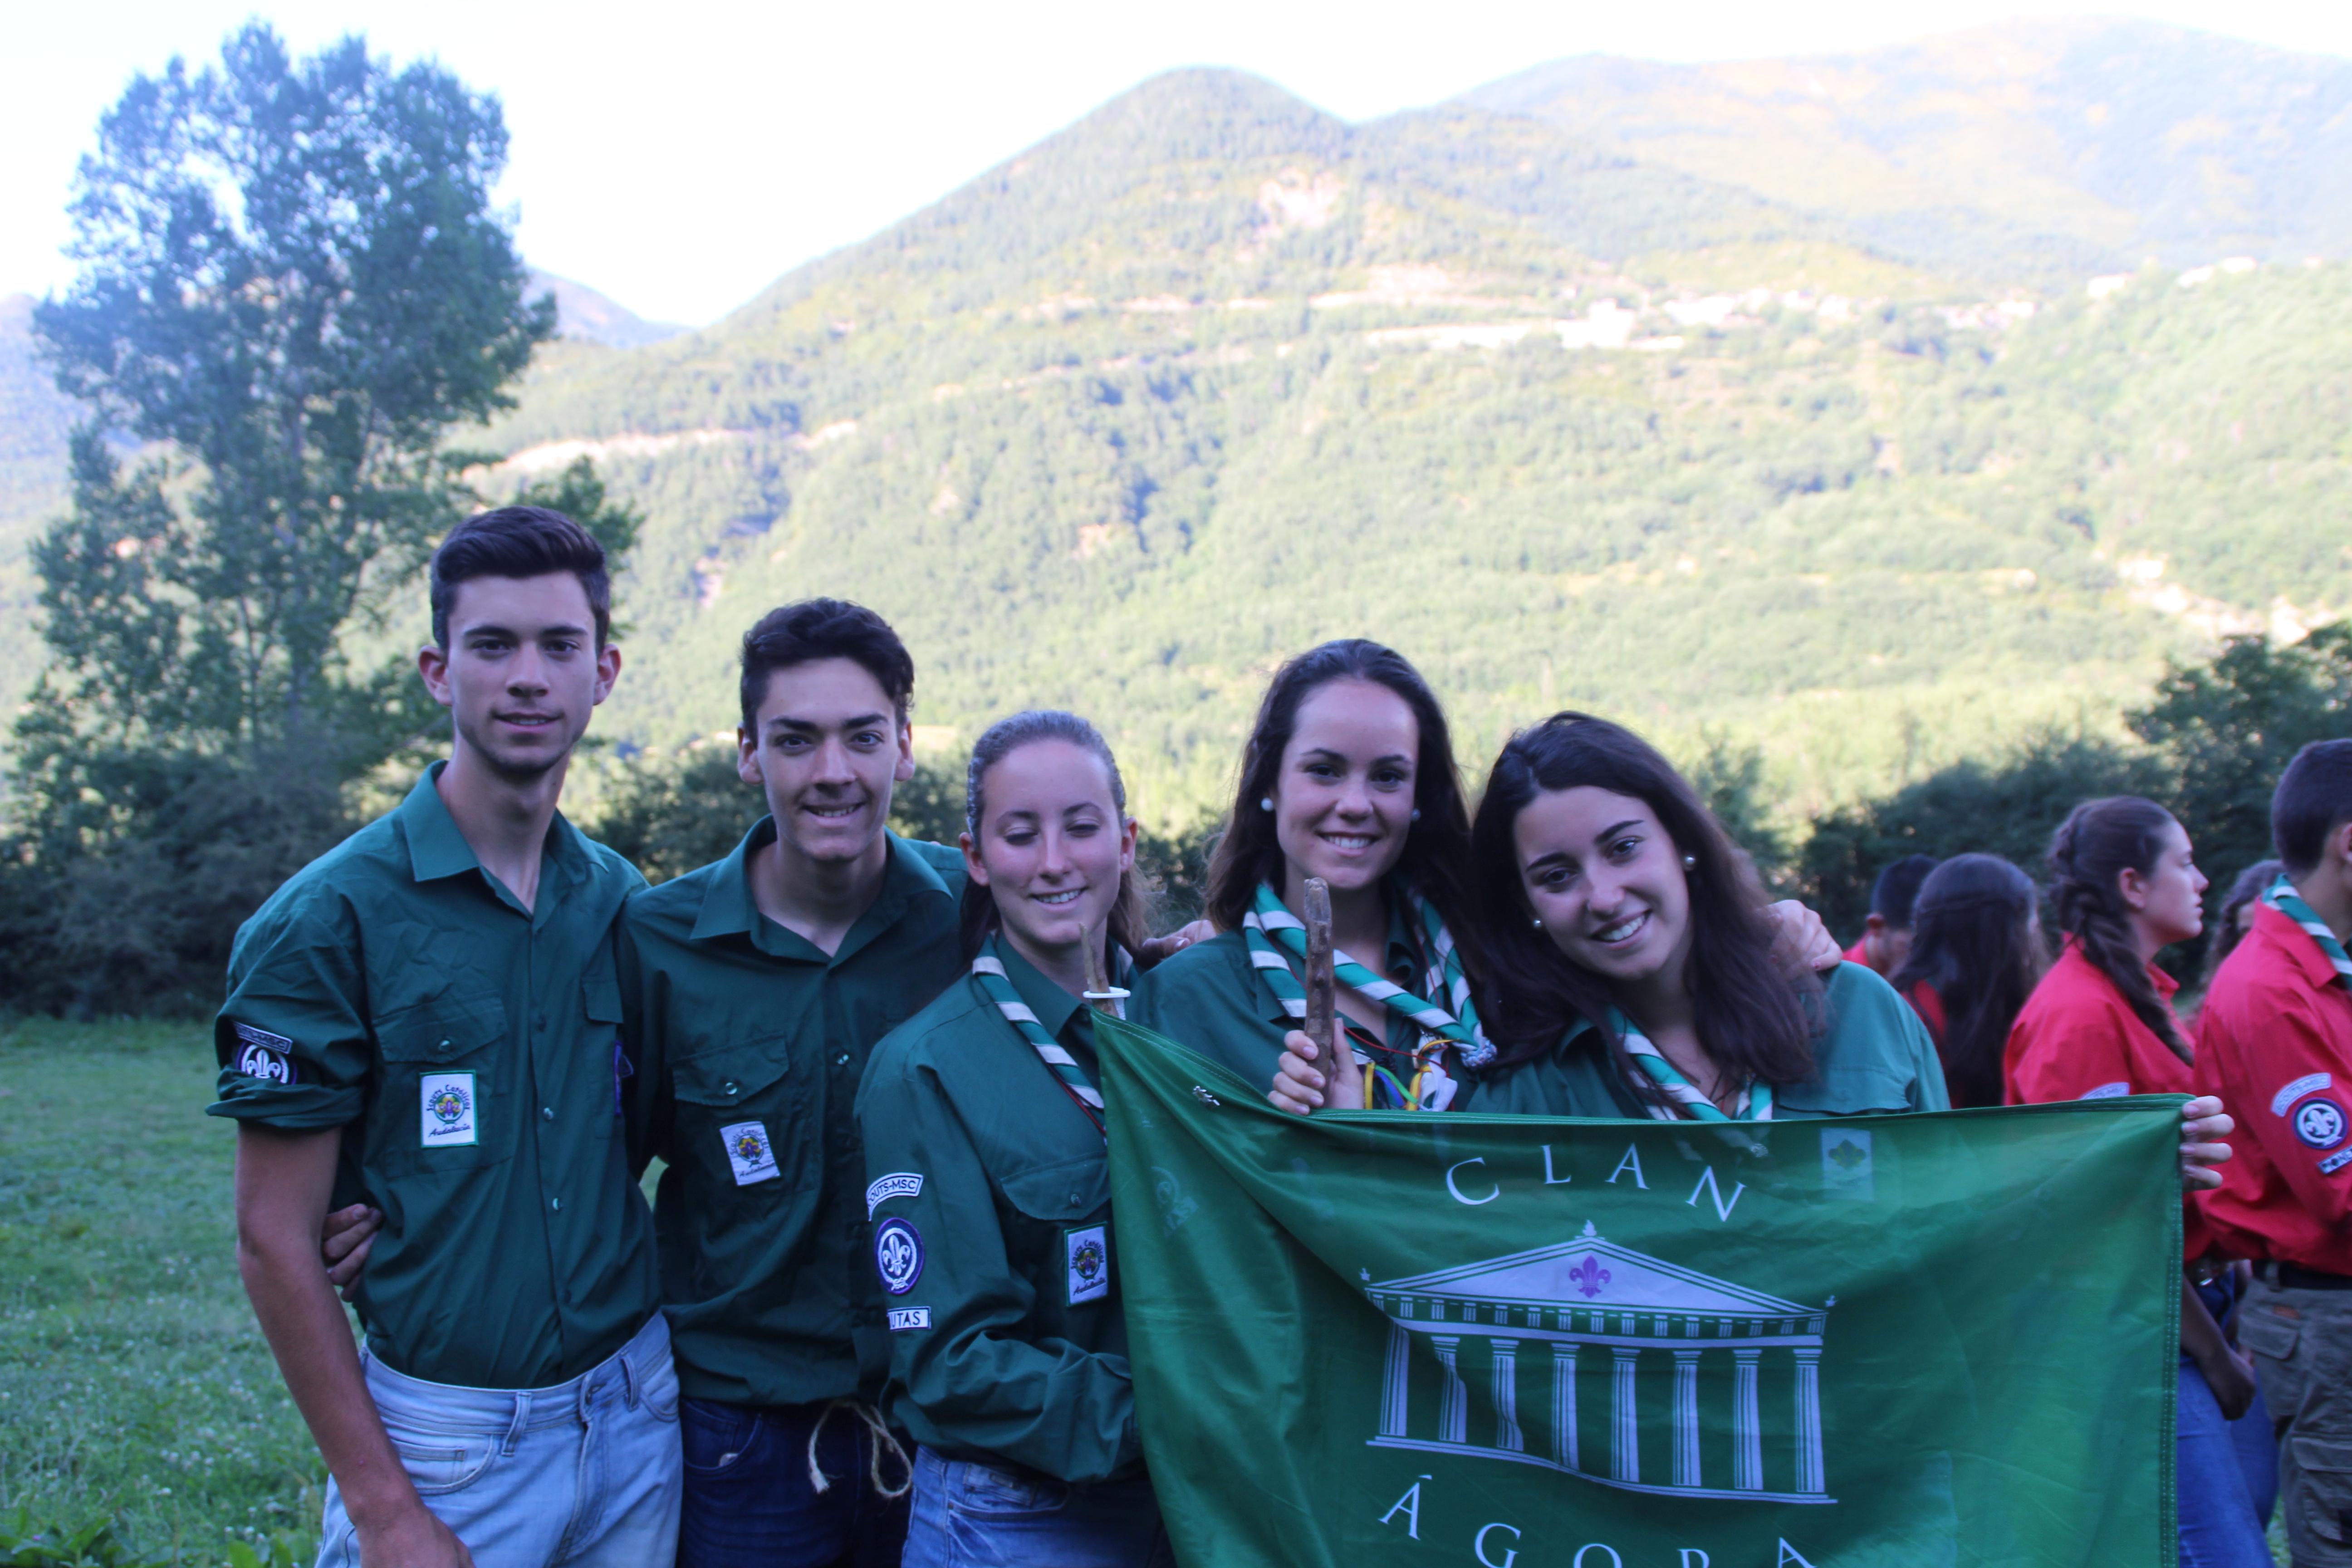 15-16 - Grupo - Campamento de verano - P302